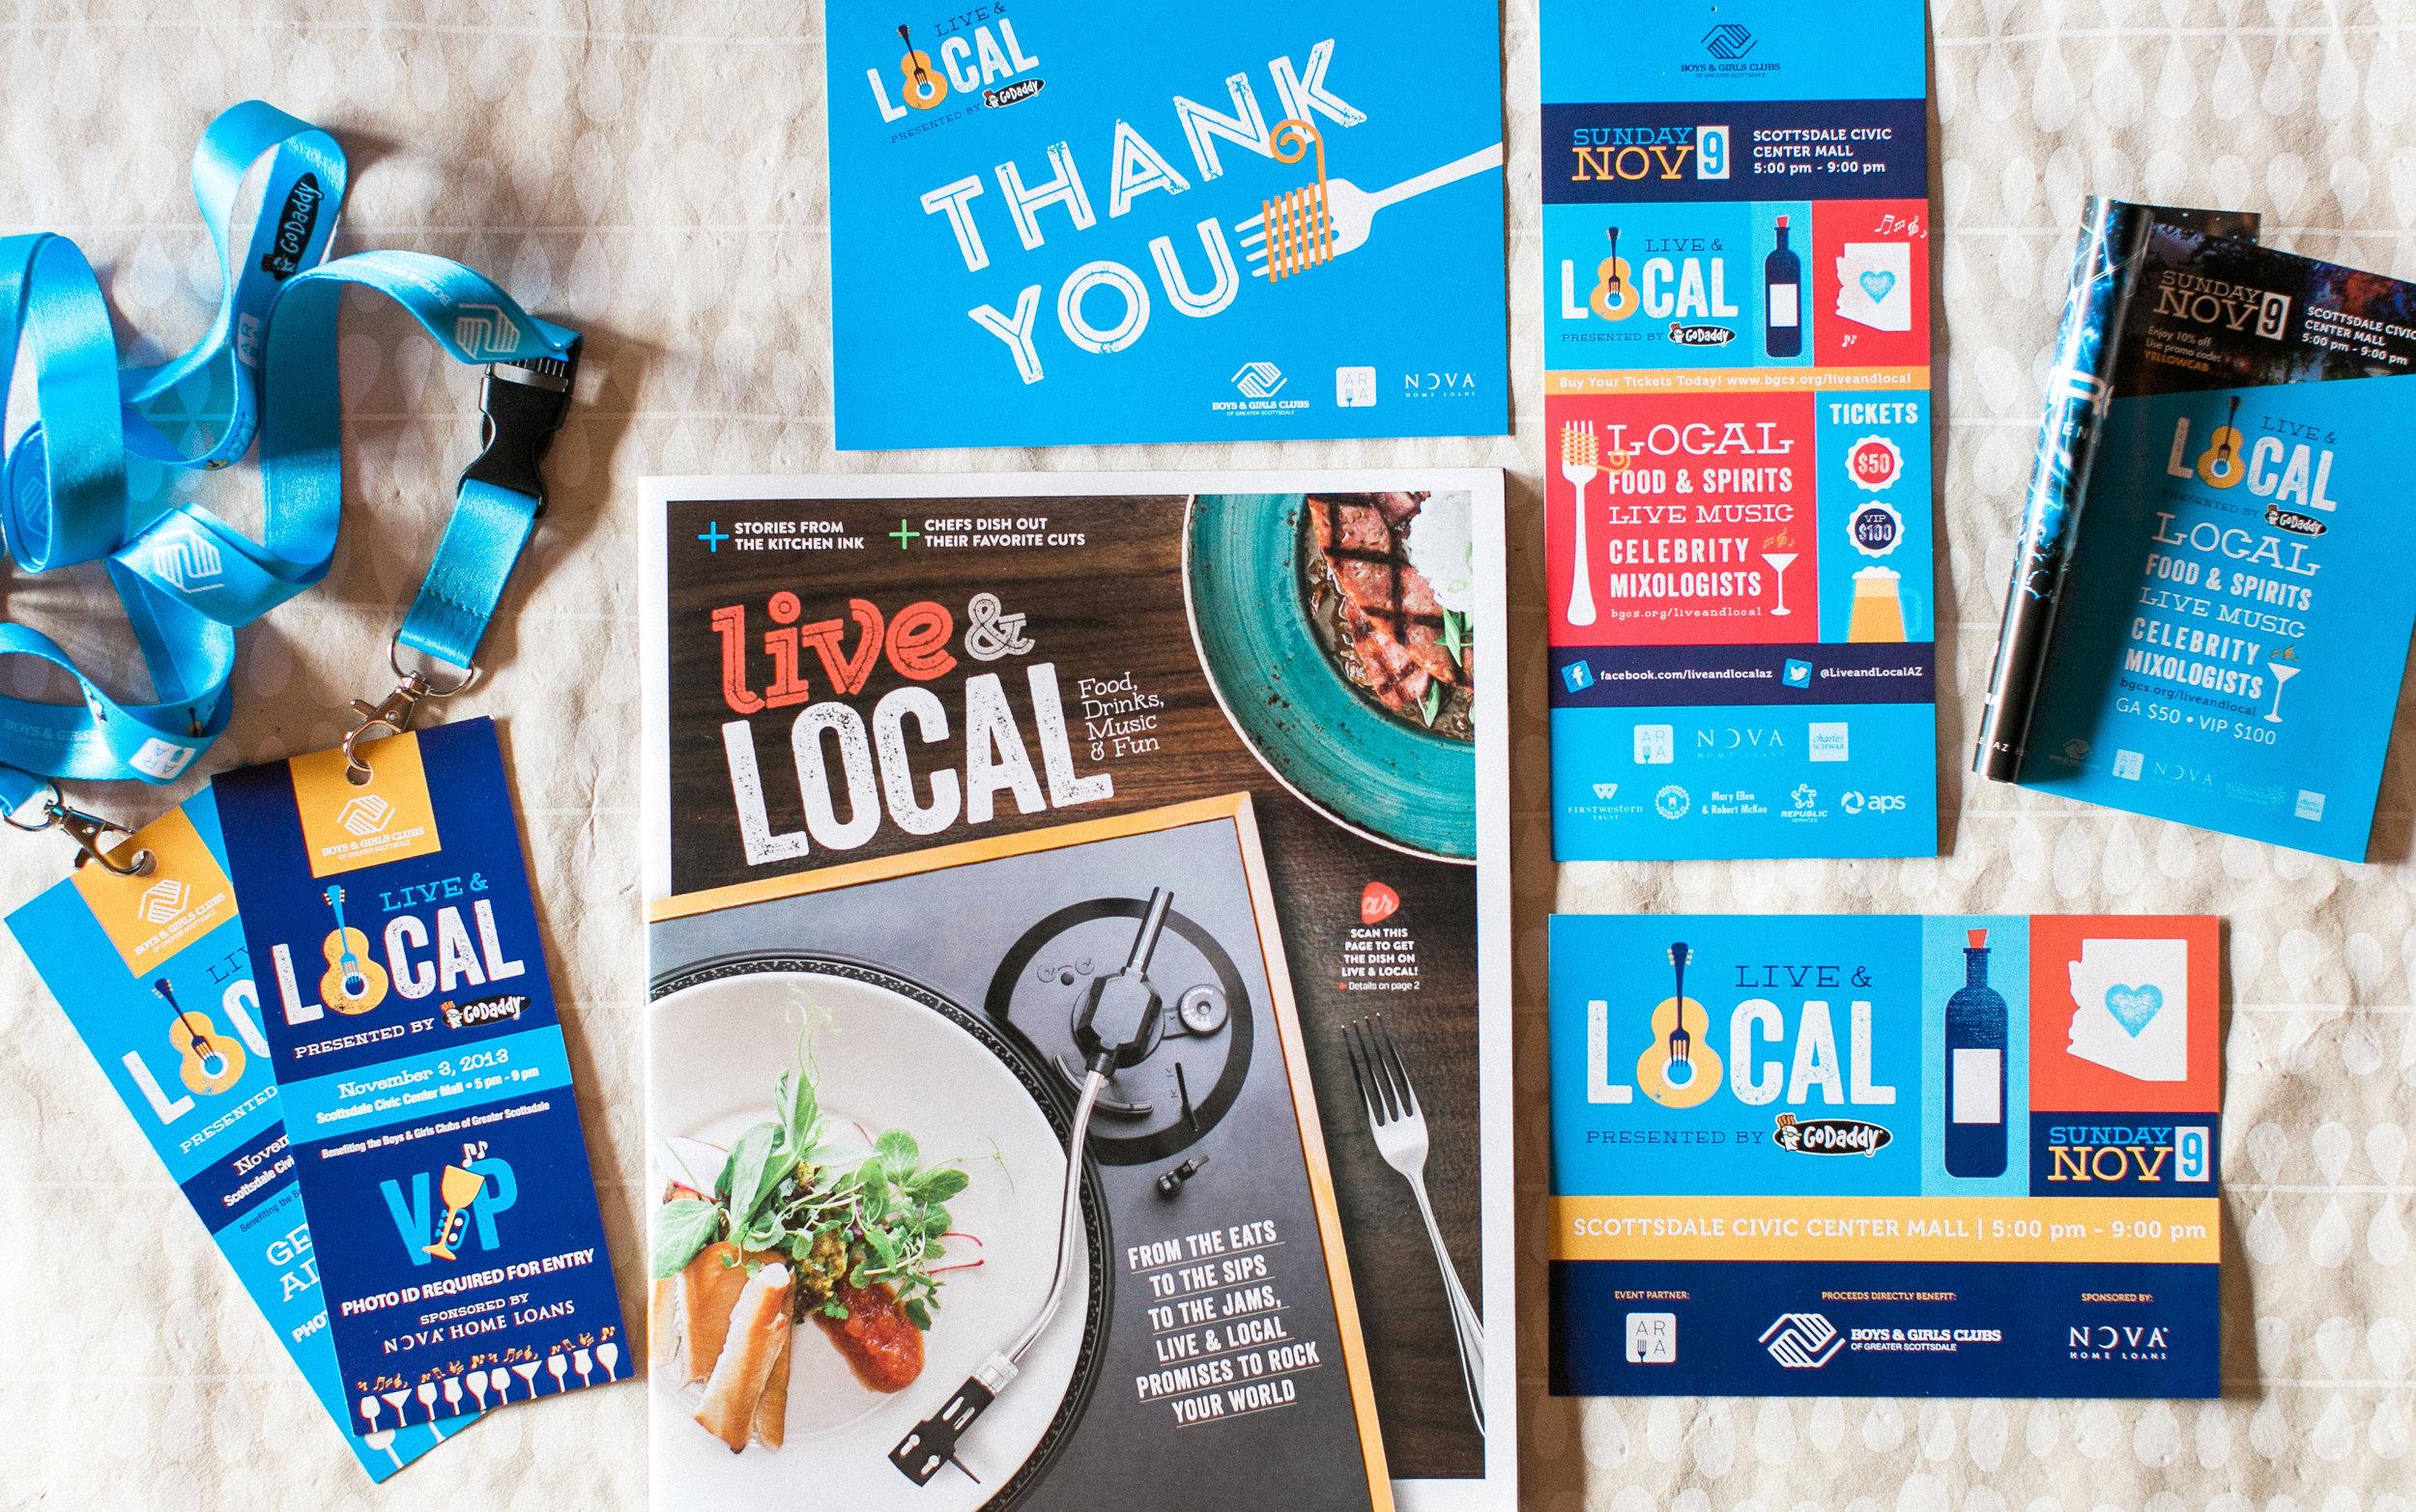 Live & Local event brand design by Pace Creative Design Studio